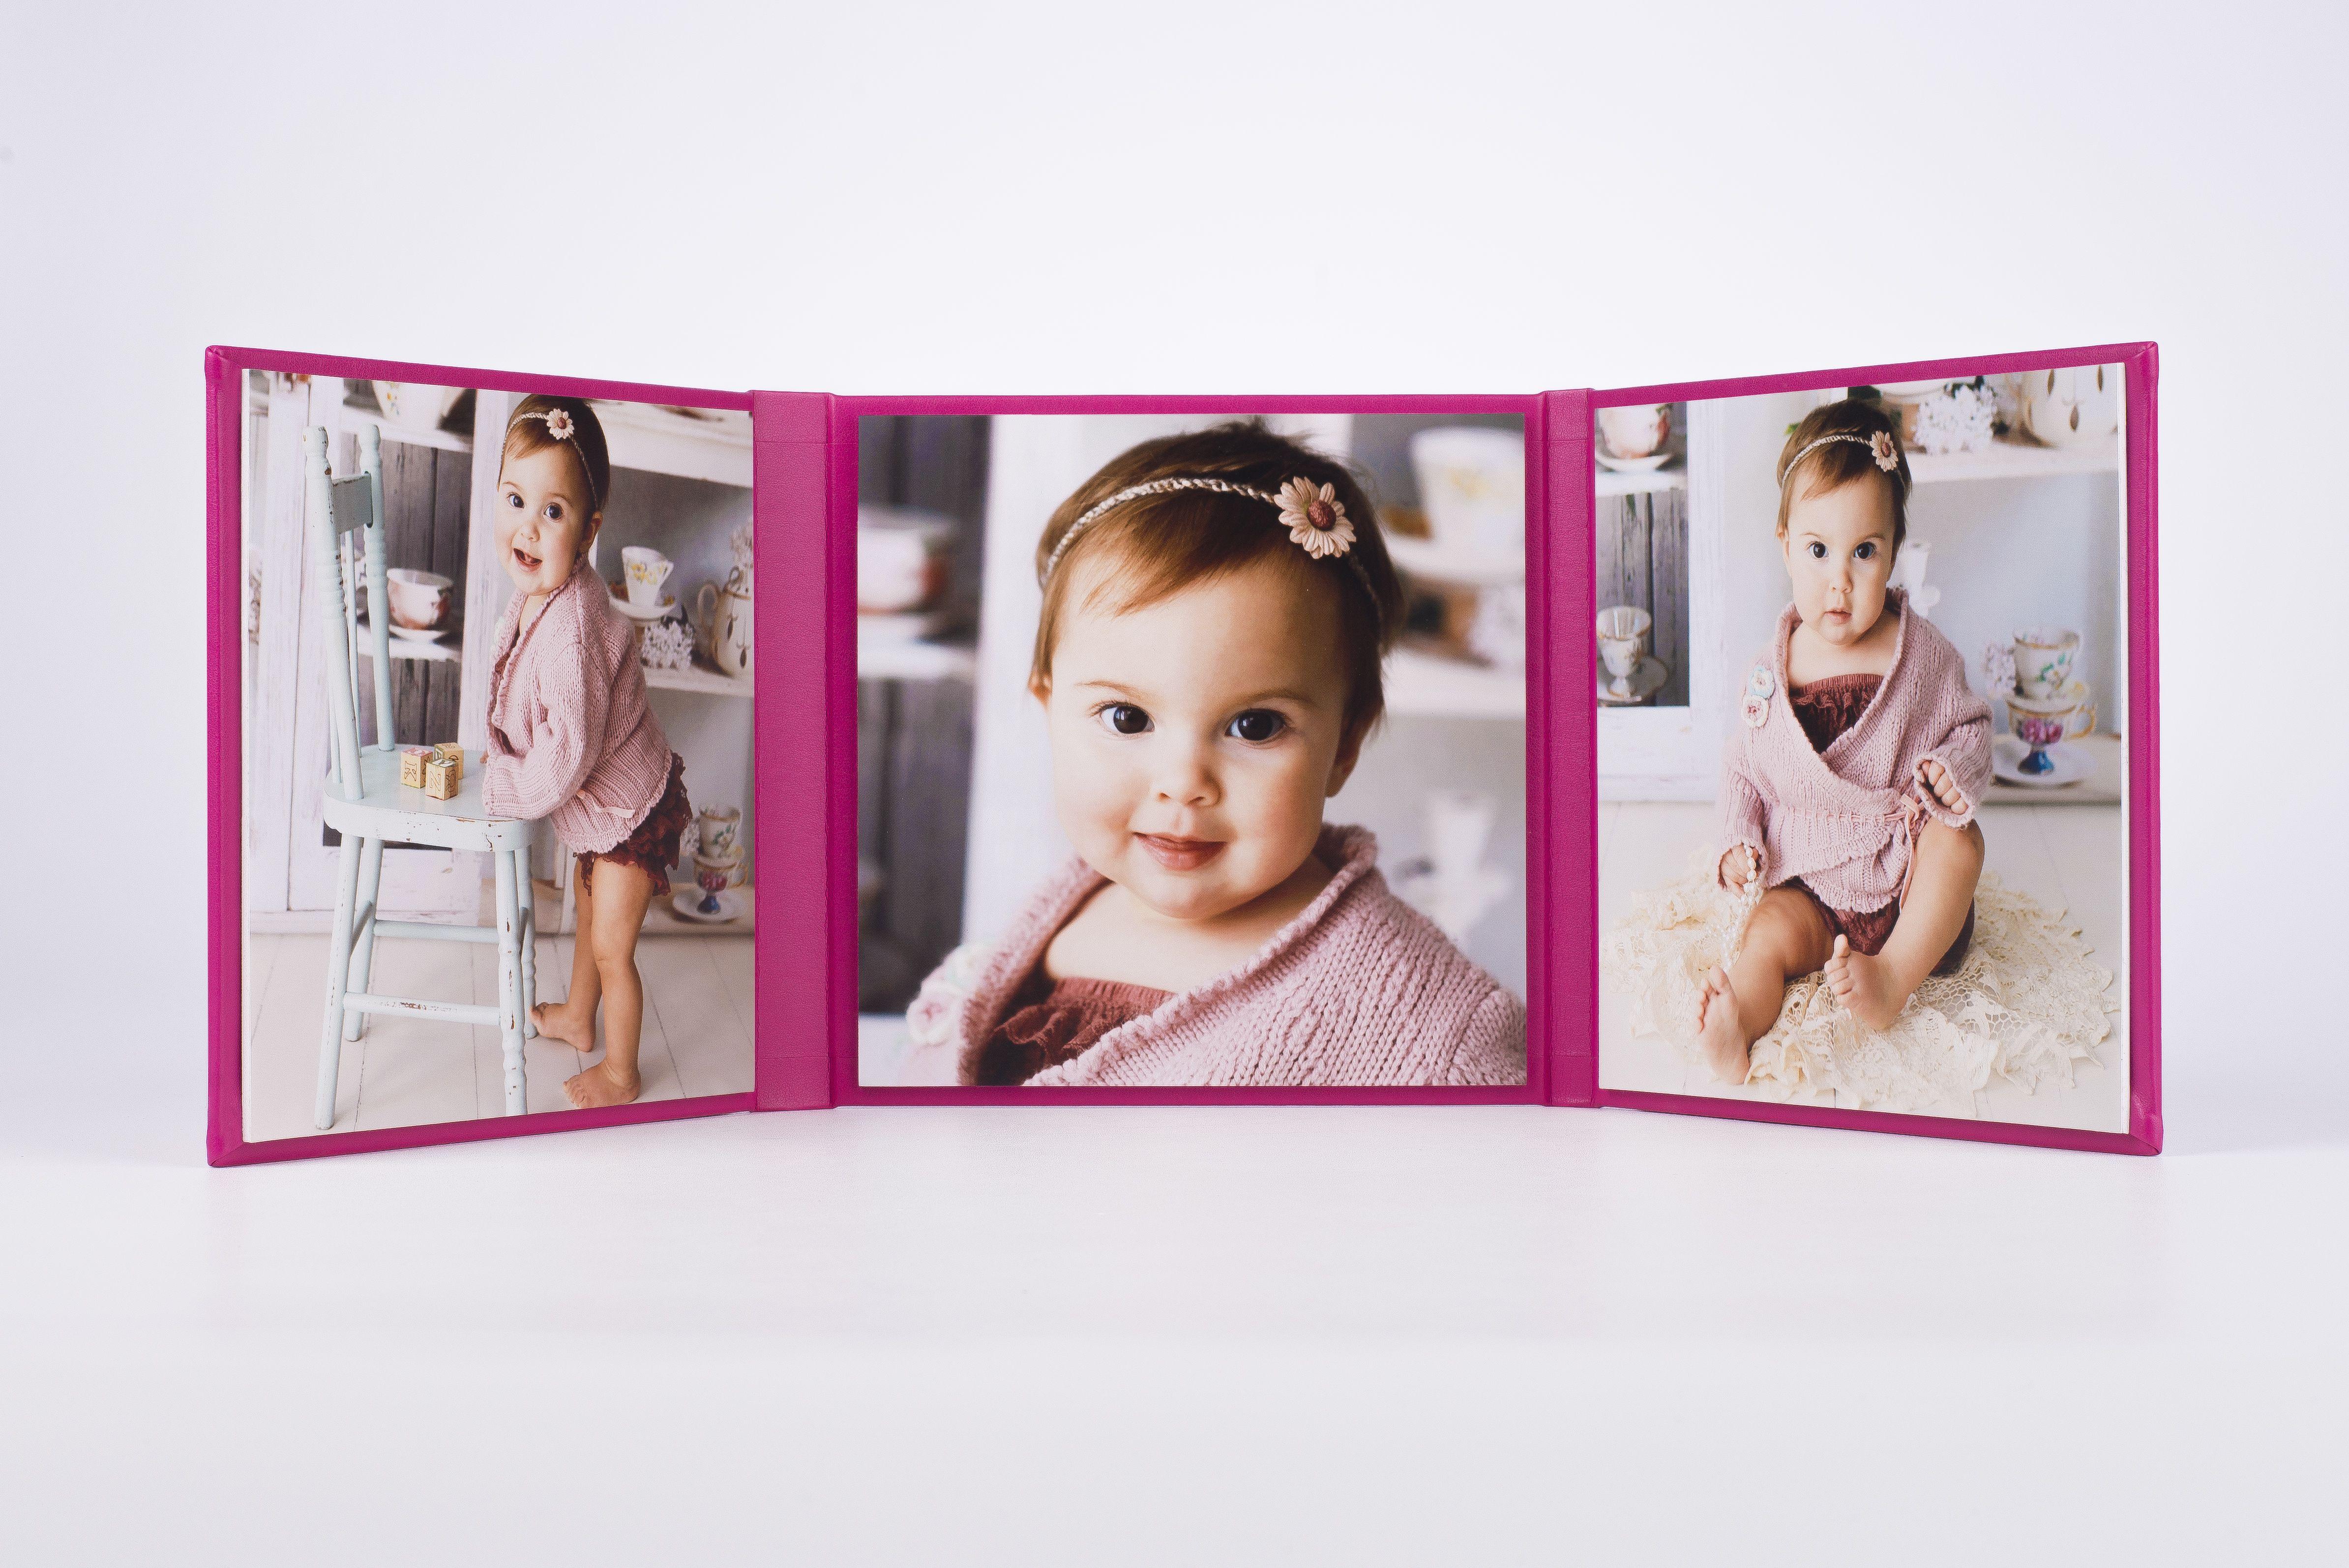 nPhoto Triplex in Bright Pink